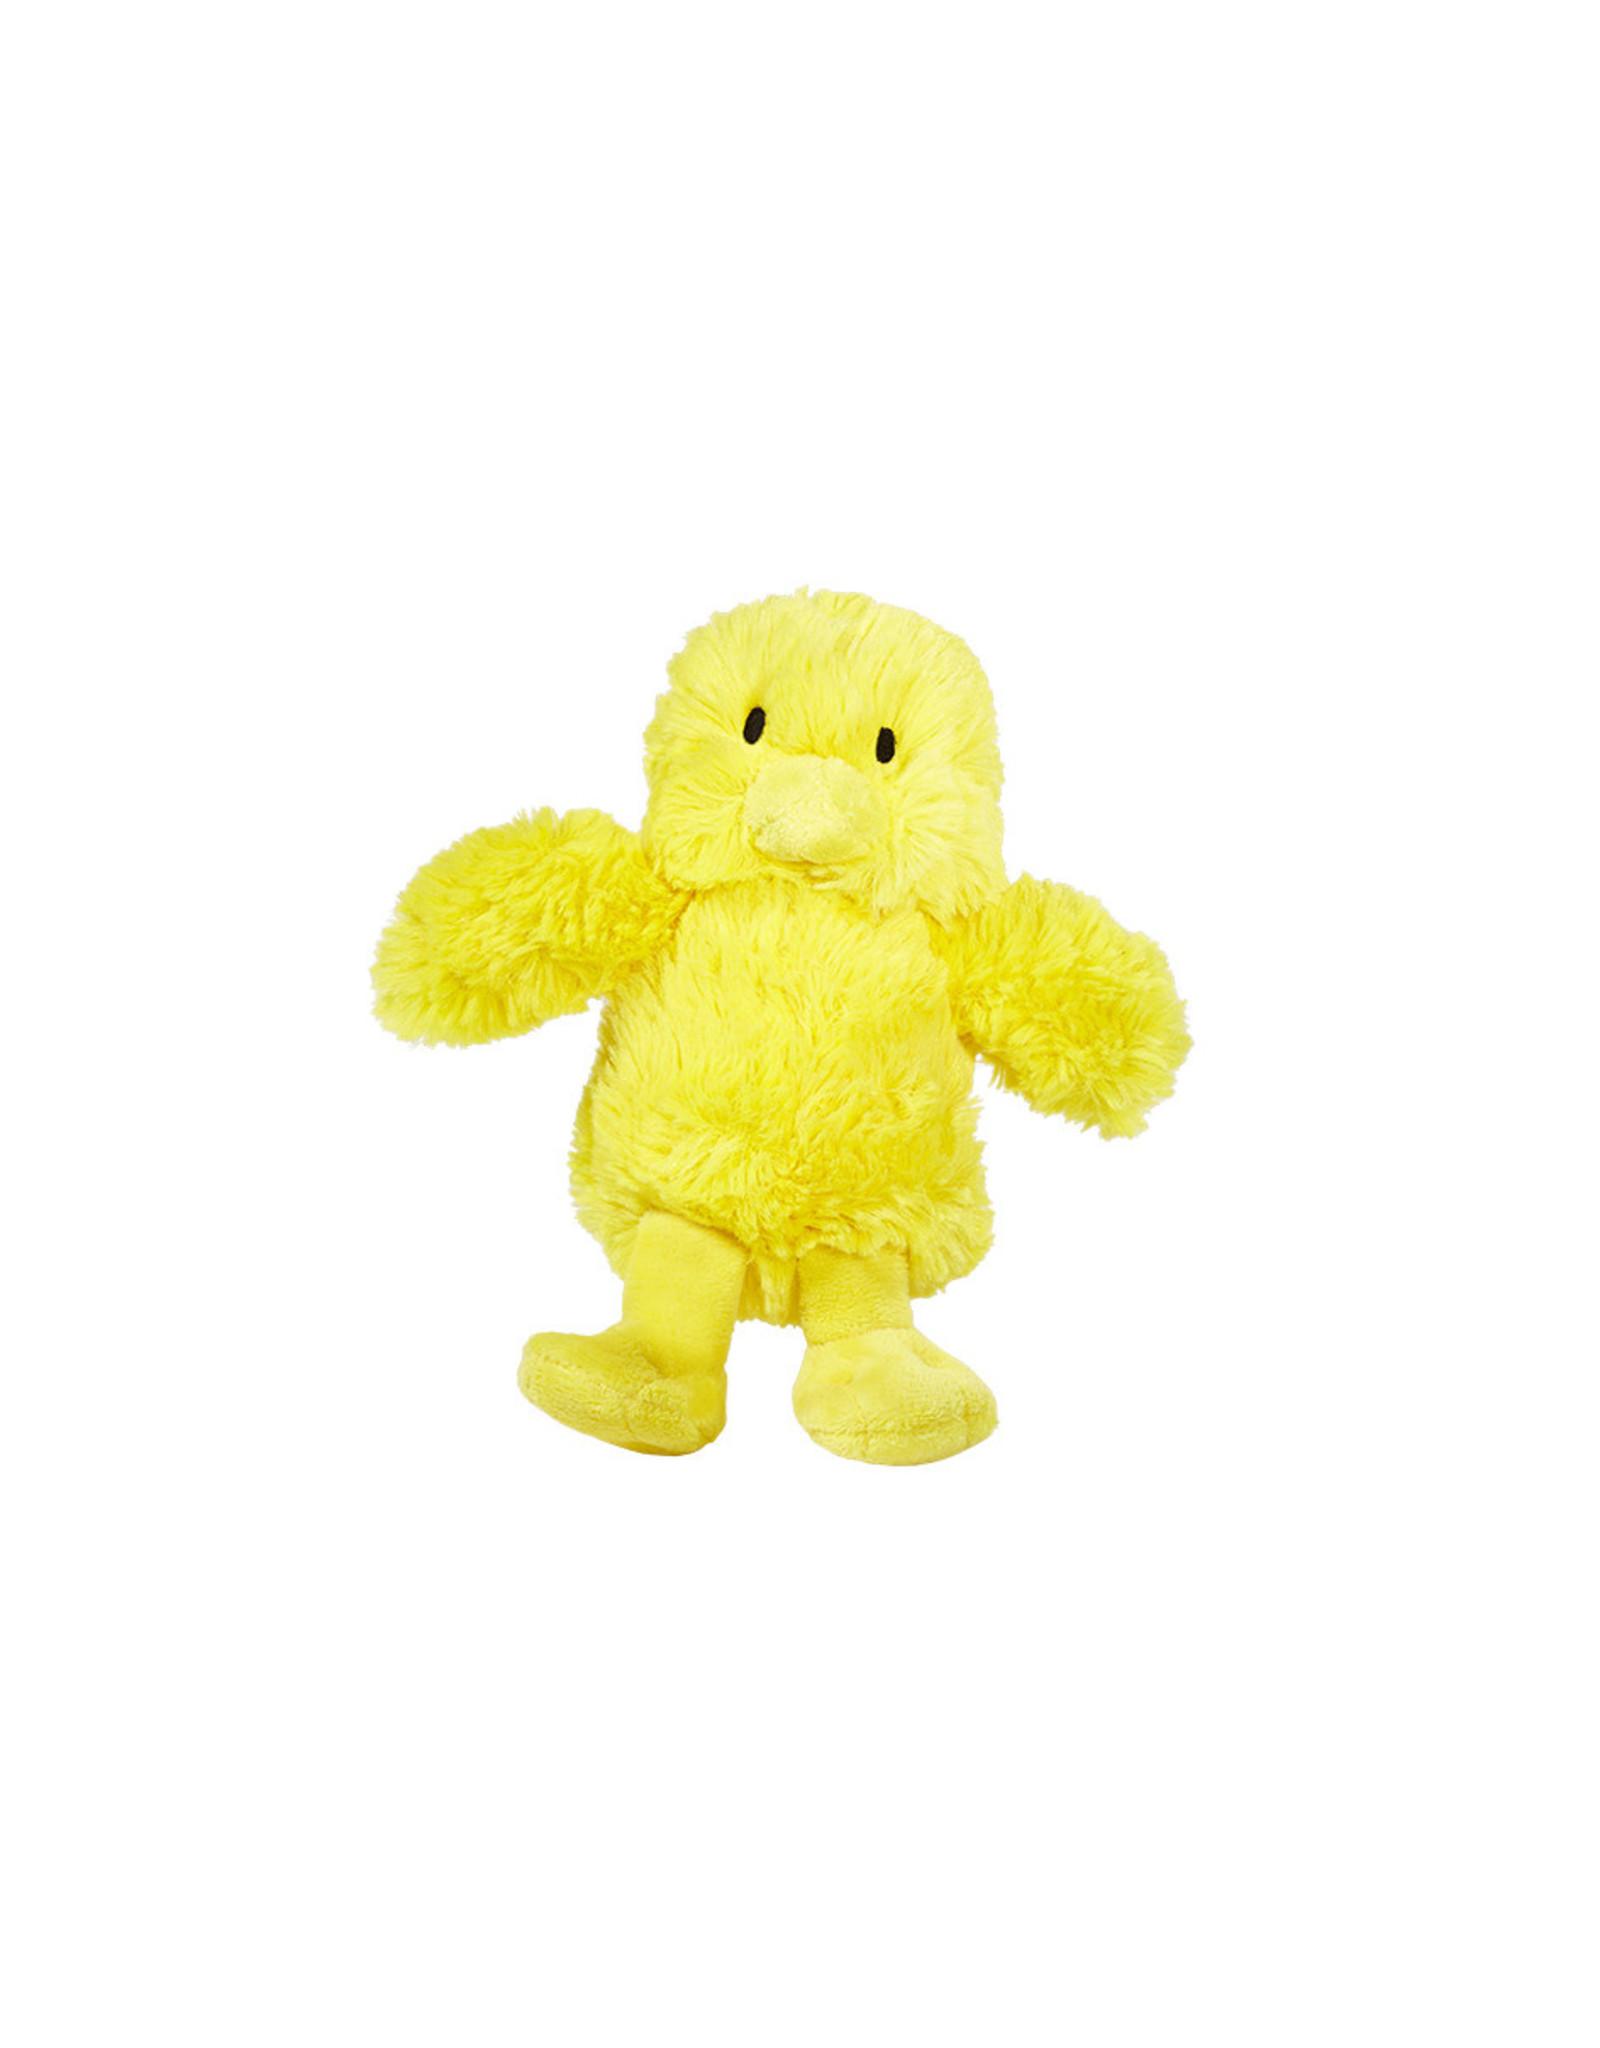 Fluff & Tuff Fluff & Tuff: Howie Duck, S